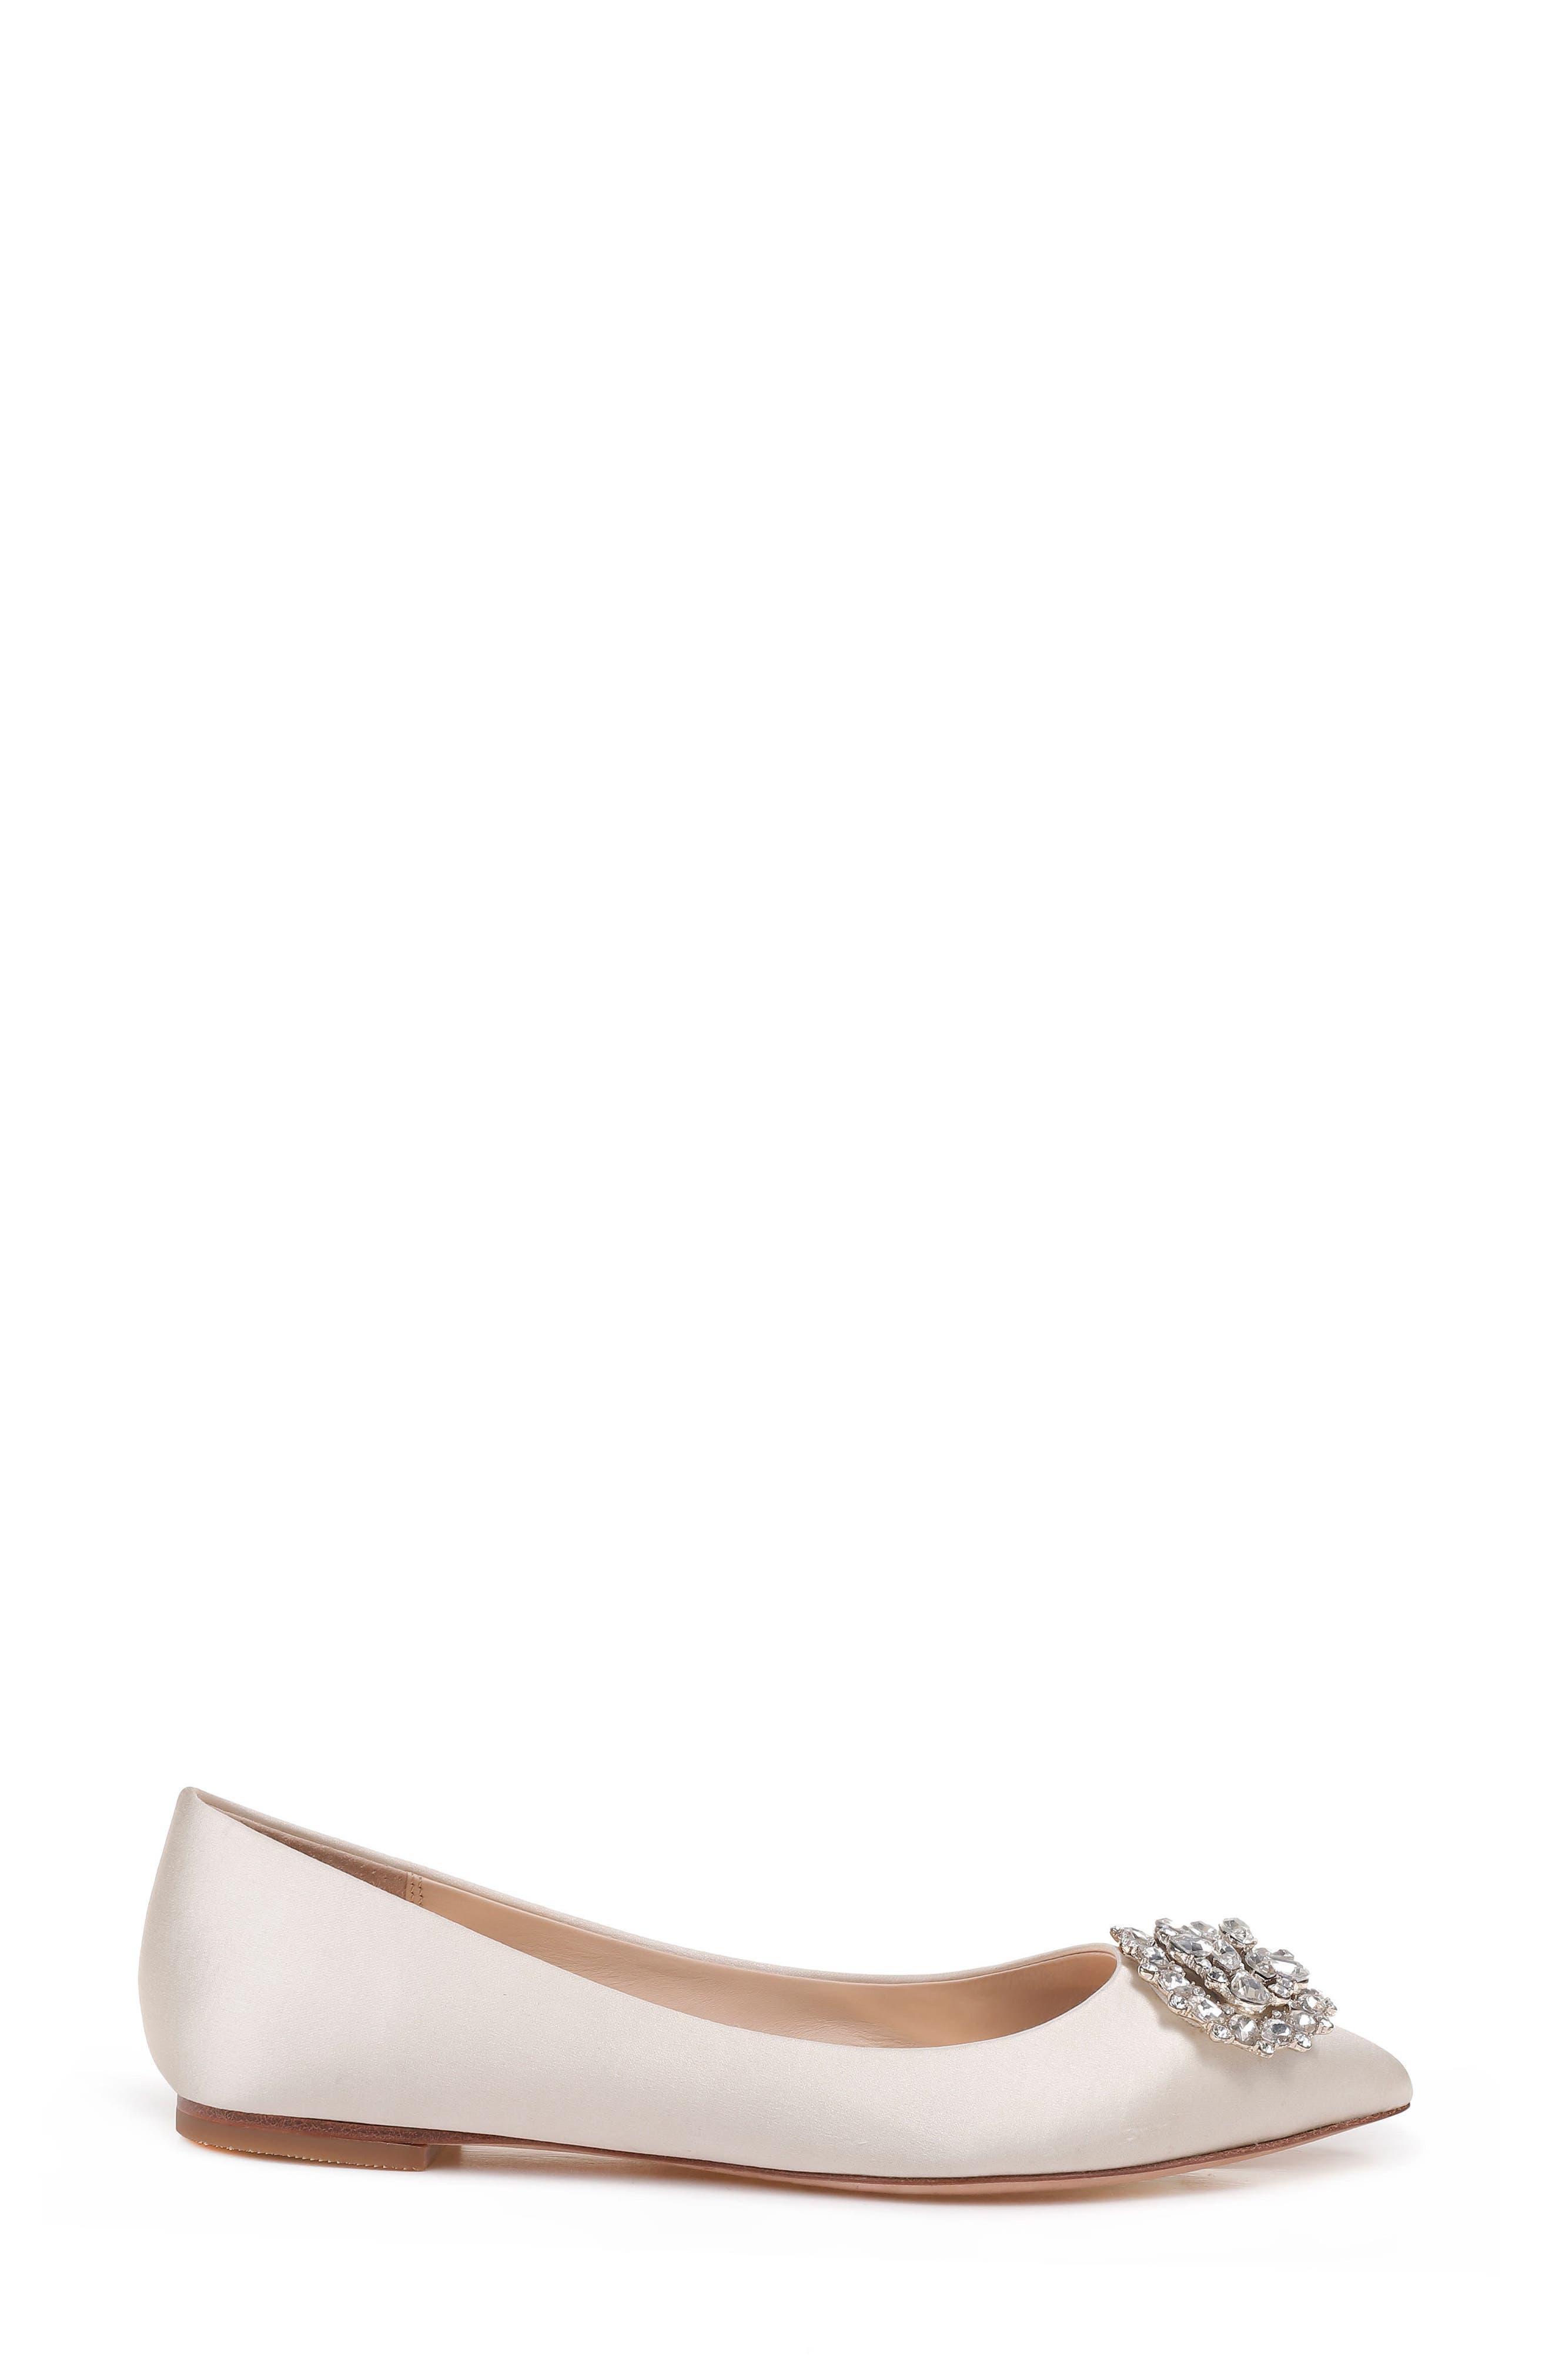 'Davis' Crystal Embellished Pointy Toe Flat,                             Alternate thumbnail 3, color,                             Ivory Satin